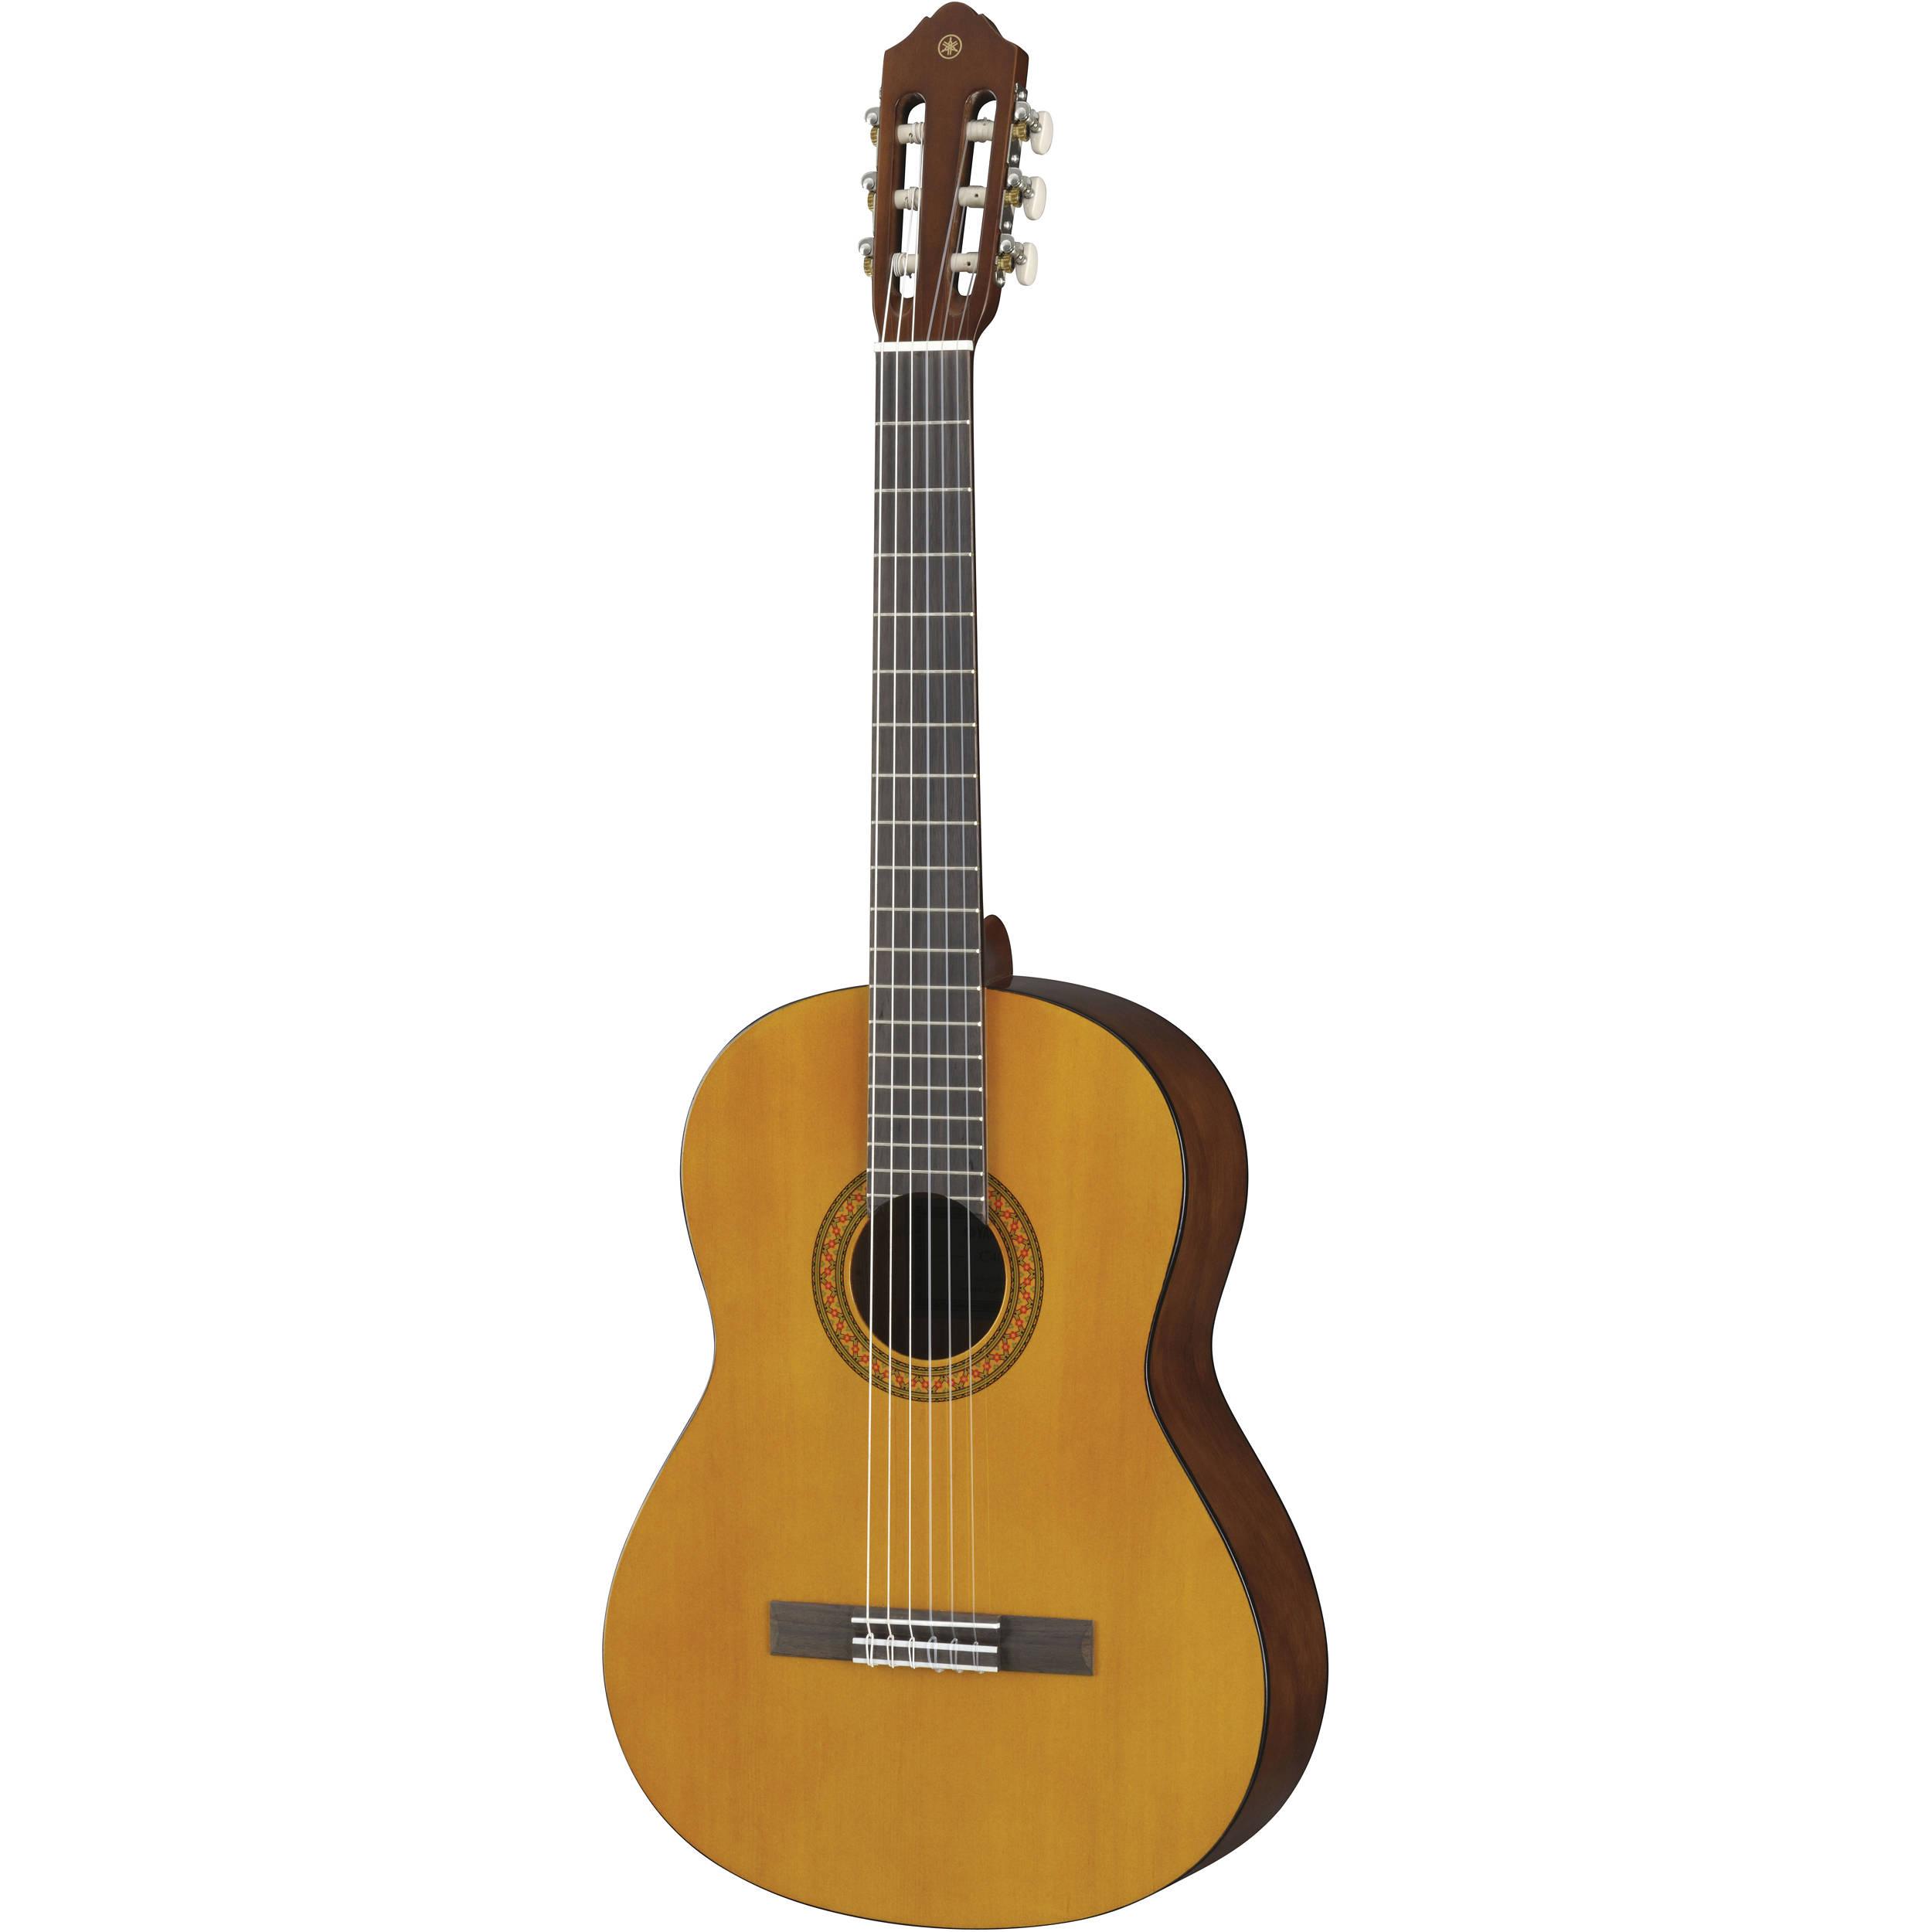 Yamaha C40II Nylon-String Classical Guitar C40II B&H Photo Video